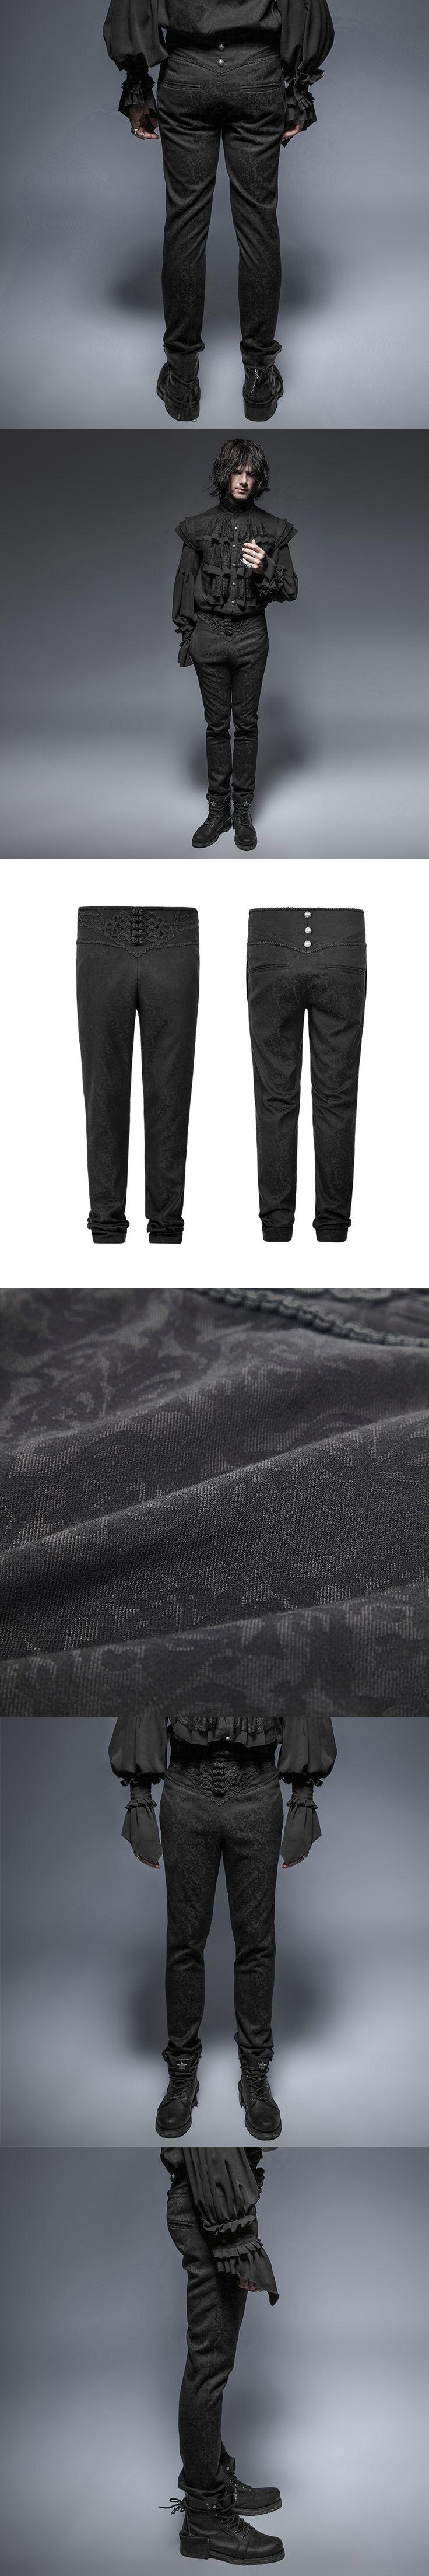 Punk Gothic Peacock Button Men Pants Black Casual High Waist Slim-Fitting Trousers 2017 Steampunk Fashion Retro Men Long Pants